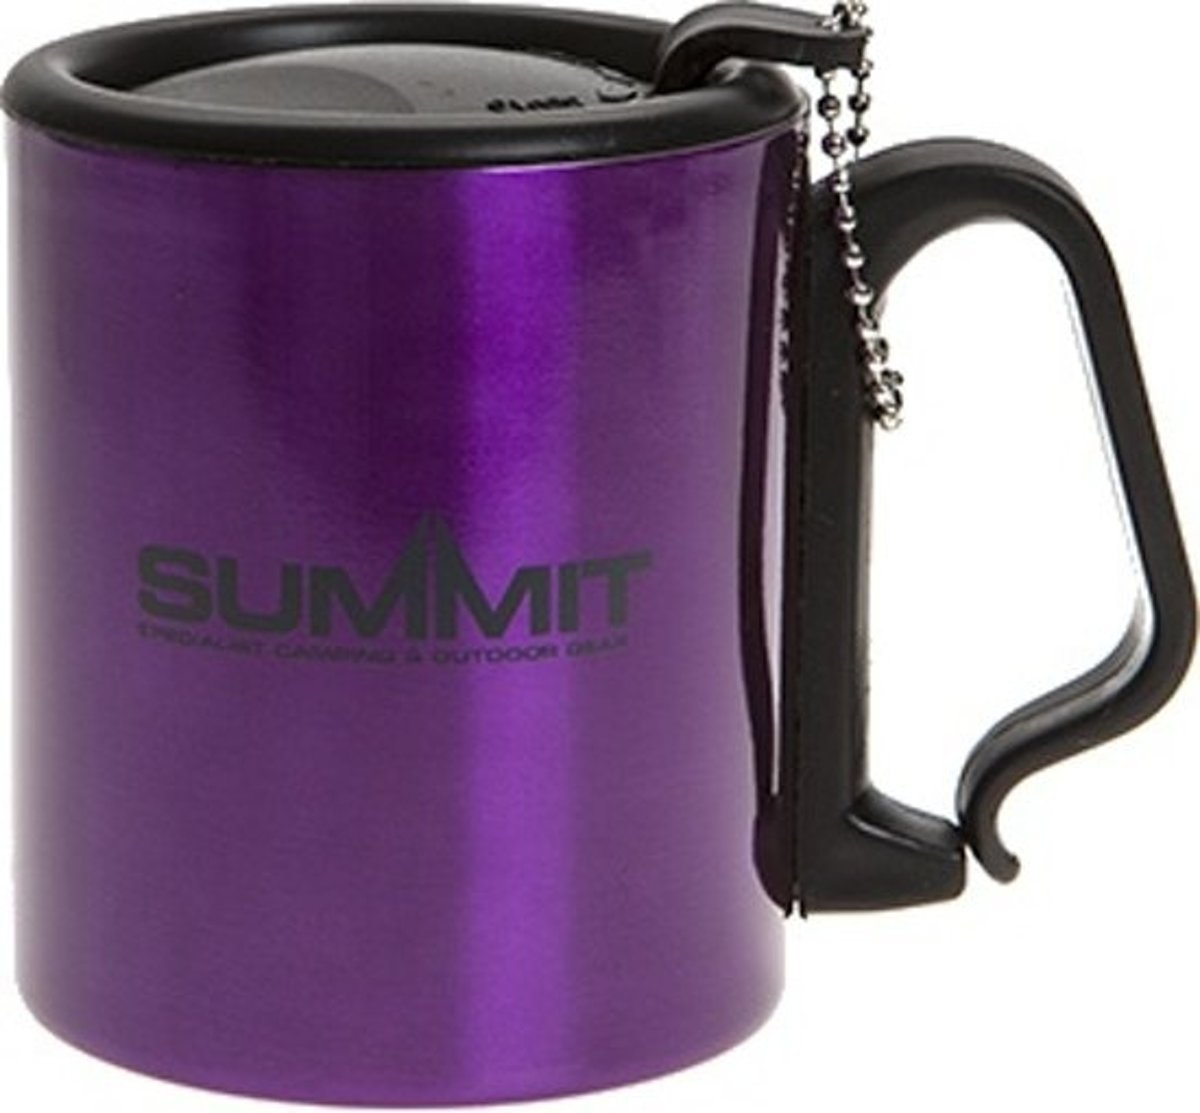 Summit Drinkbeker Met Deksel Aluminium Paars 300 Ml kopen